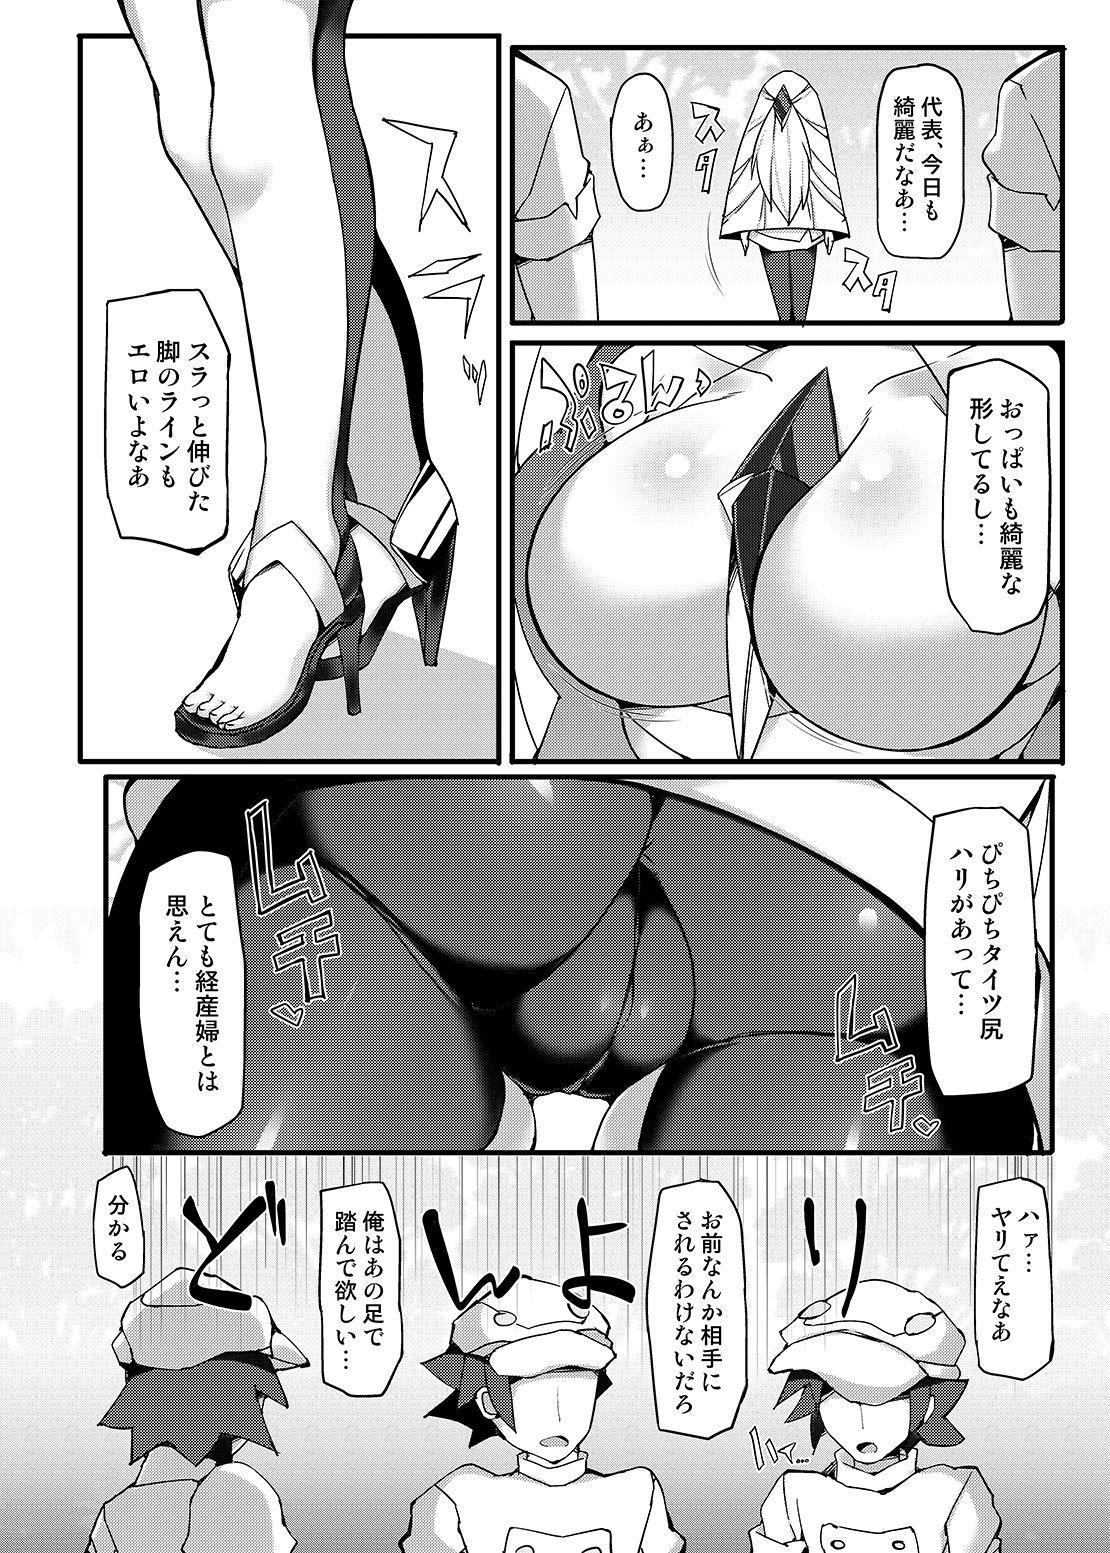 [Stapspats (Hisui)] Stapspats [Pocket Monster Saimin Series Soushuuhen] 1 Collective Hypnosis (Pokémon) [Digital] 60